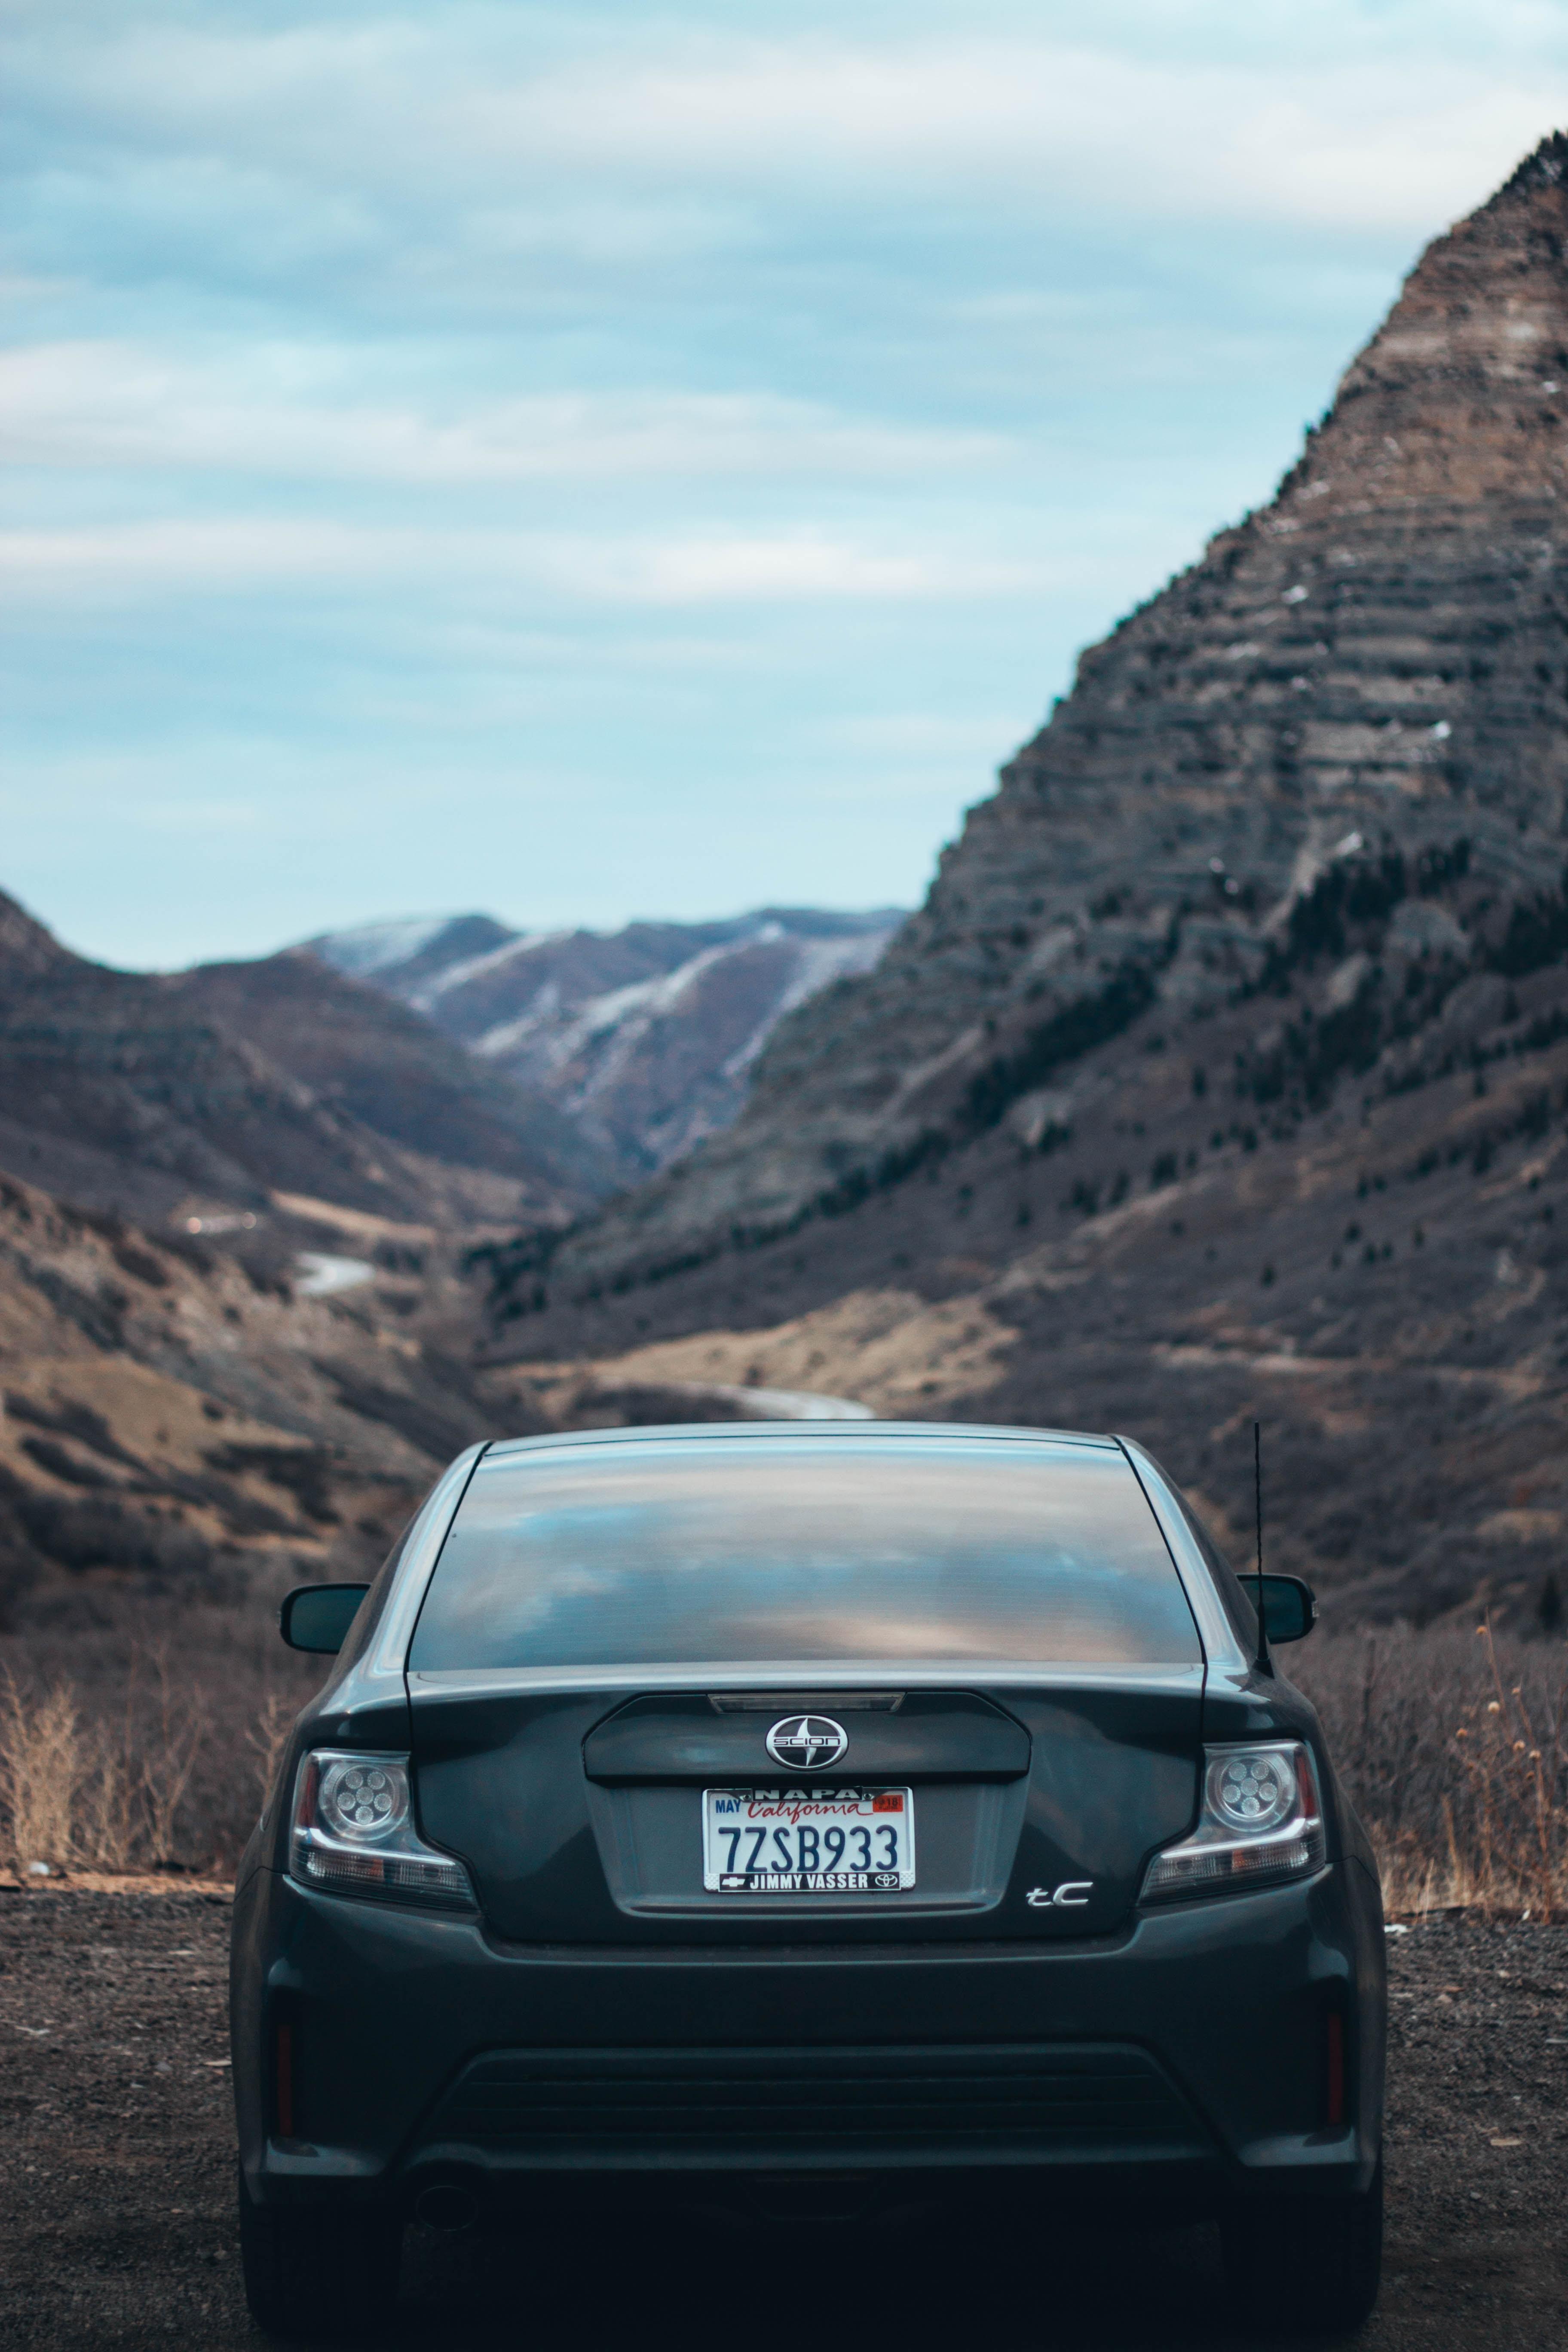 black Scion car parked near mountain range